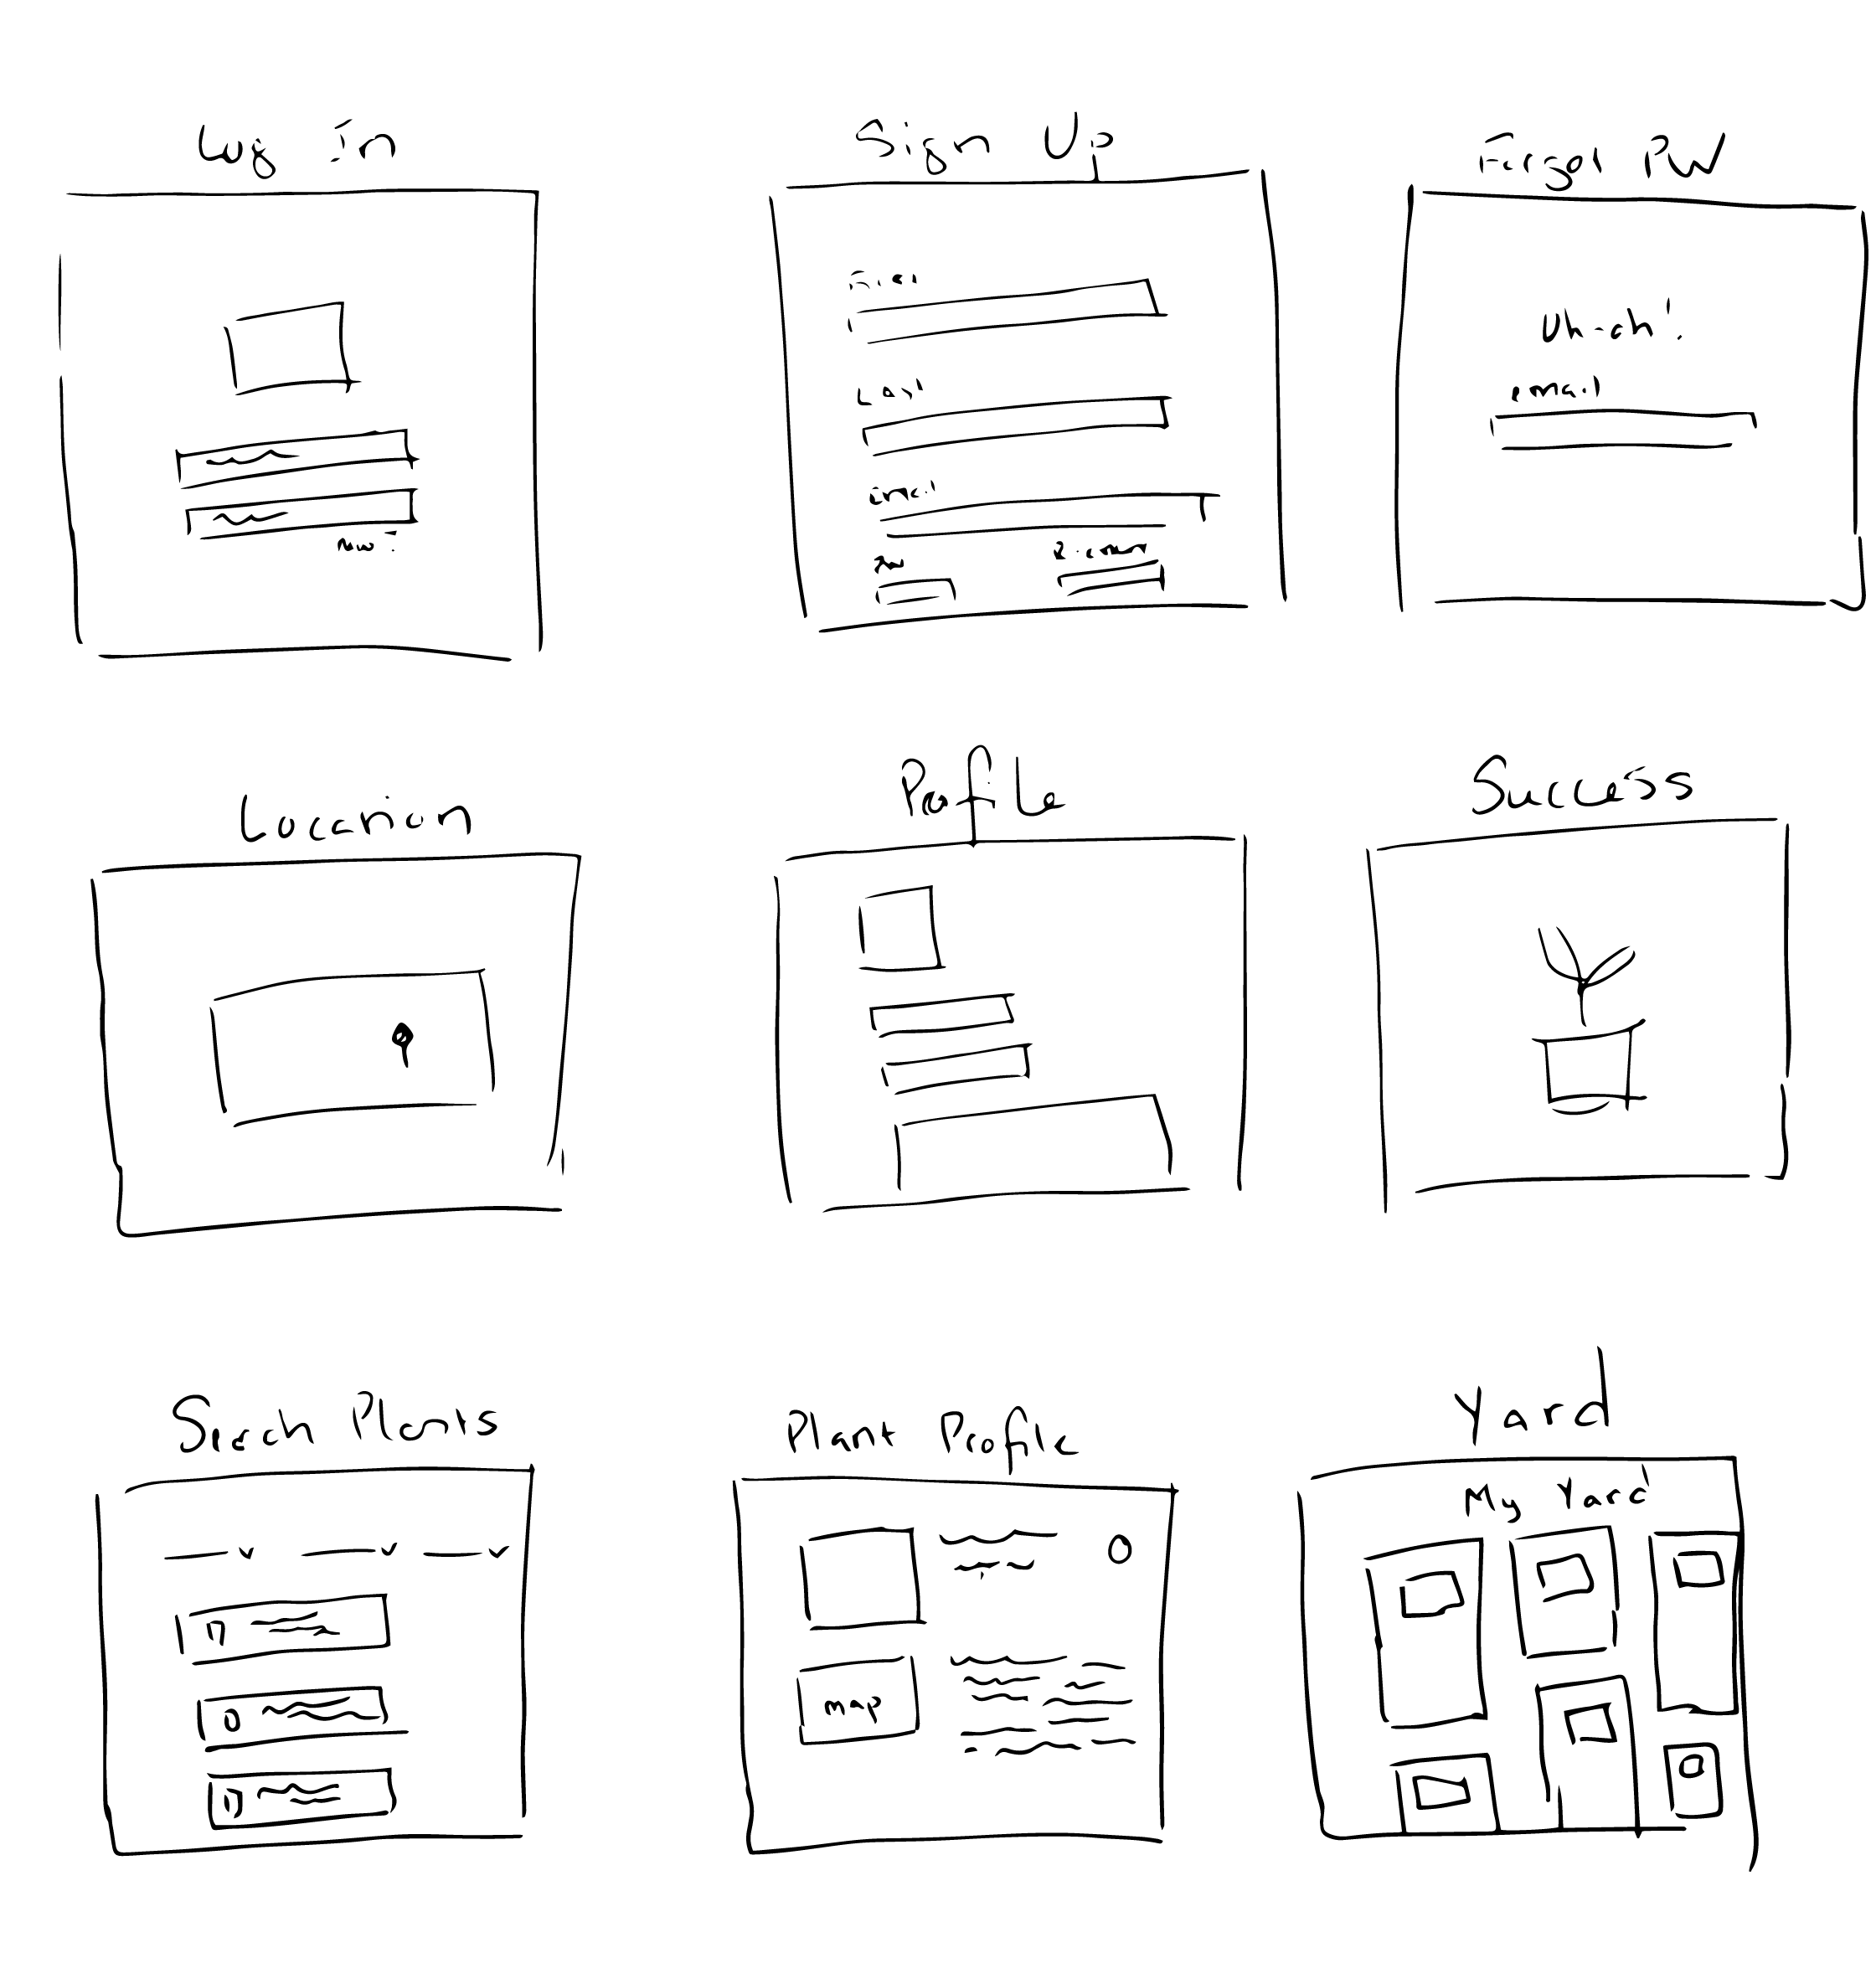 sketching screens in your app